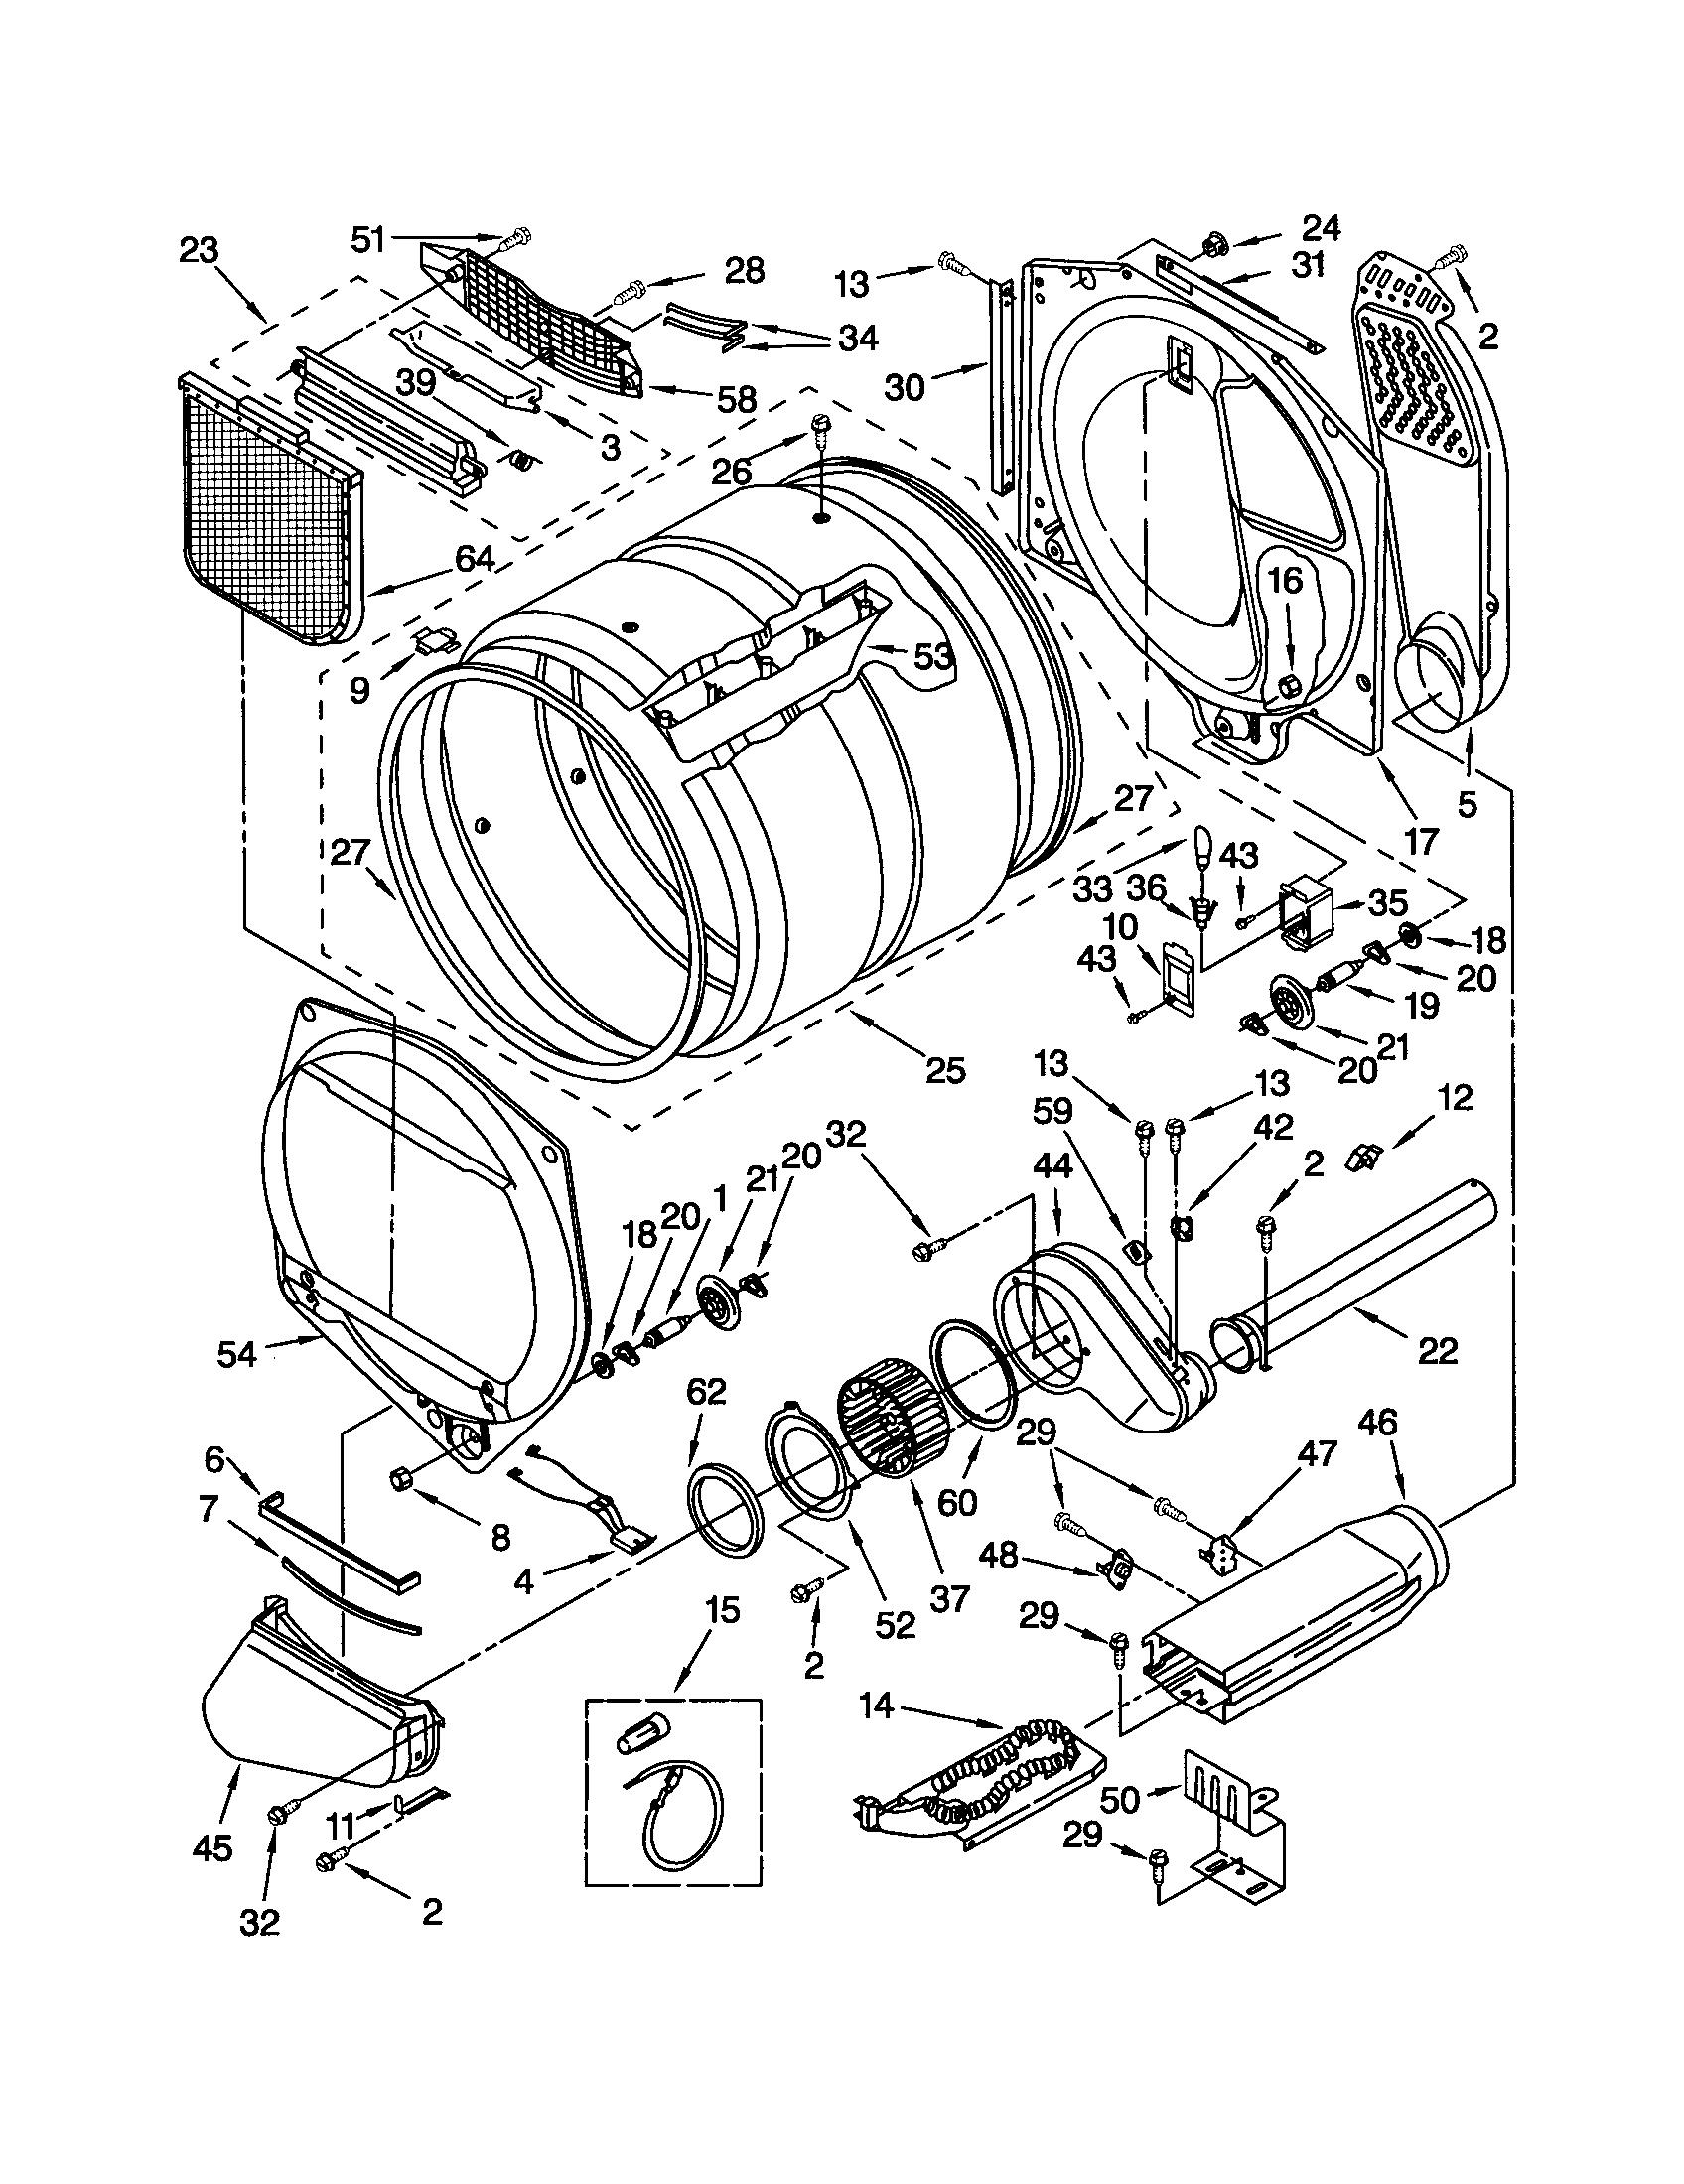 Kenmore 110 Dryer Lint Filter Screen